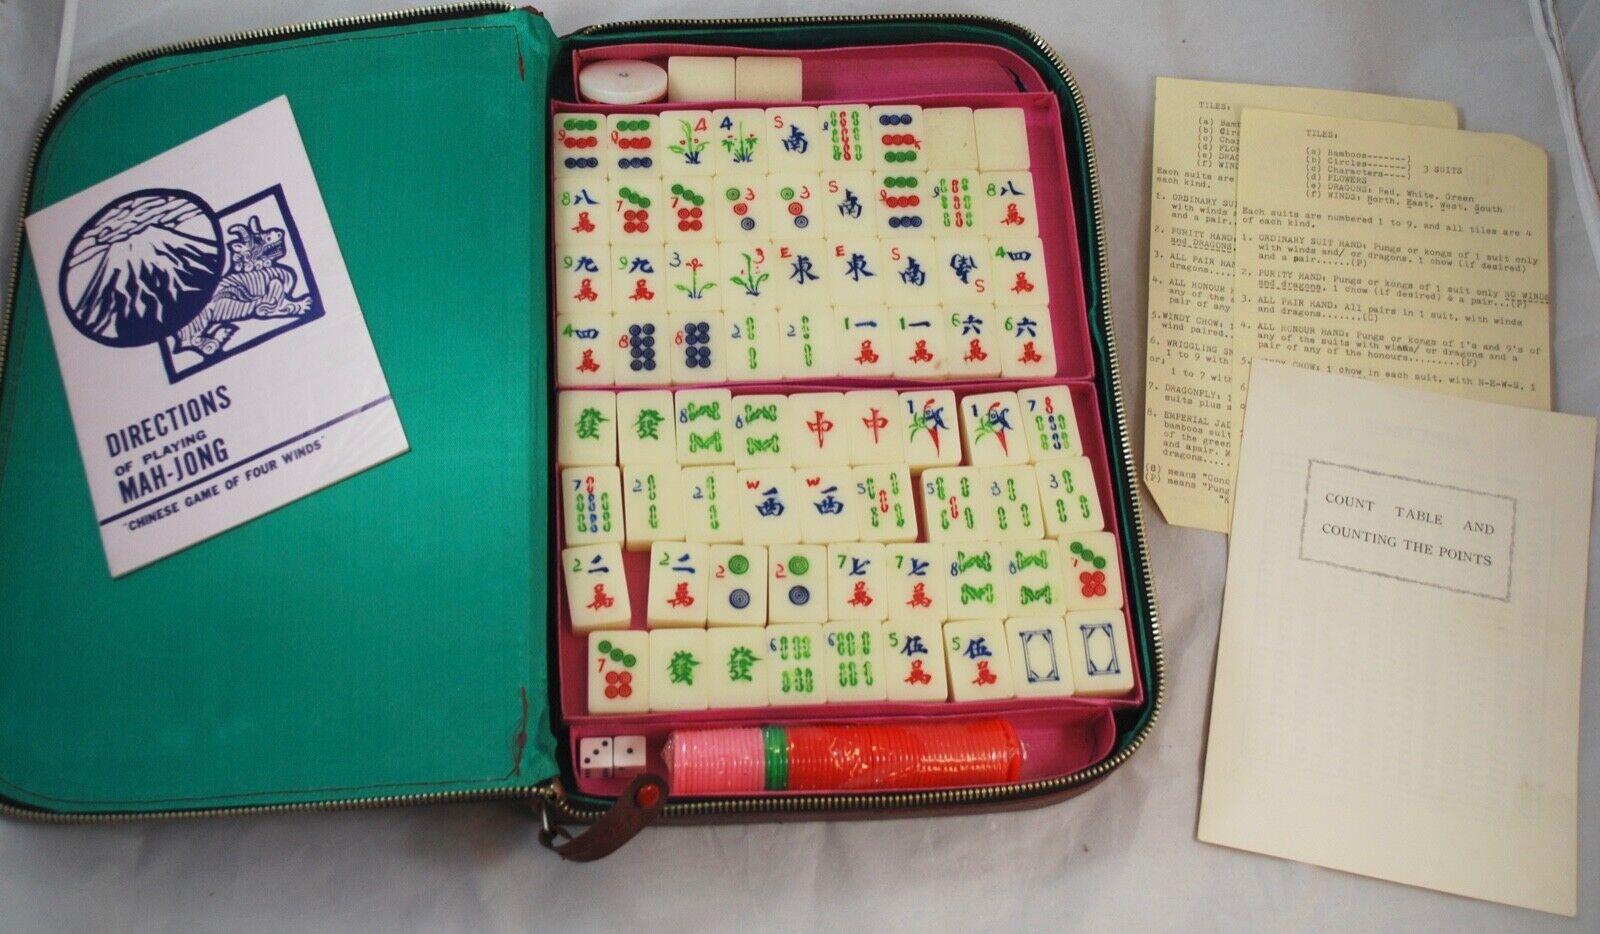 Vintage Mah Jong Mahjong Set  with zip around travel case 142 Tiles  nuovi prodotti novità